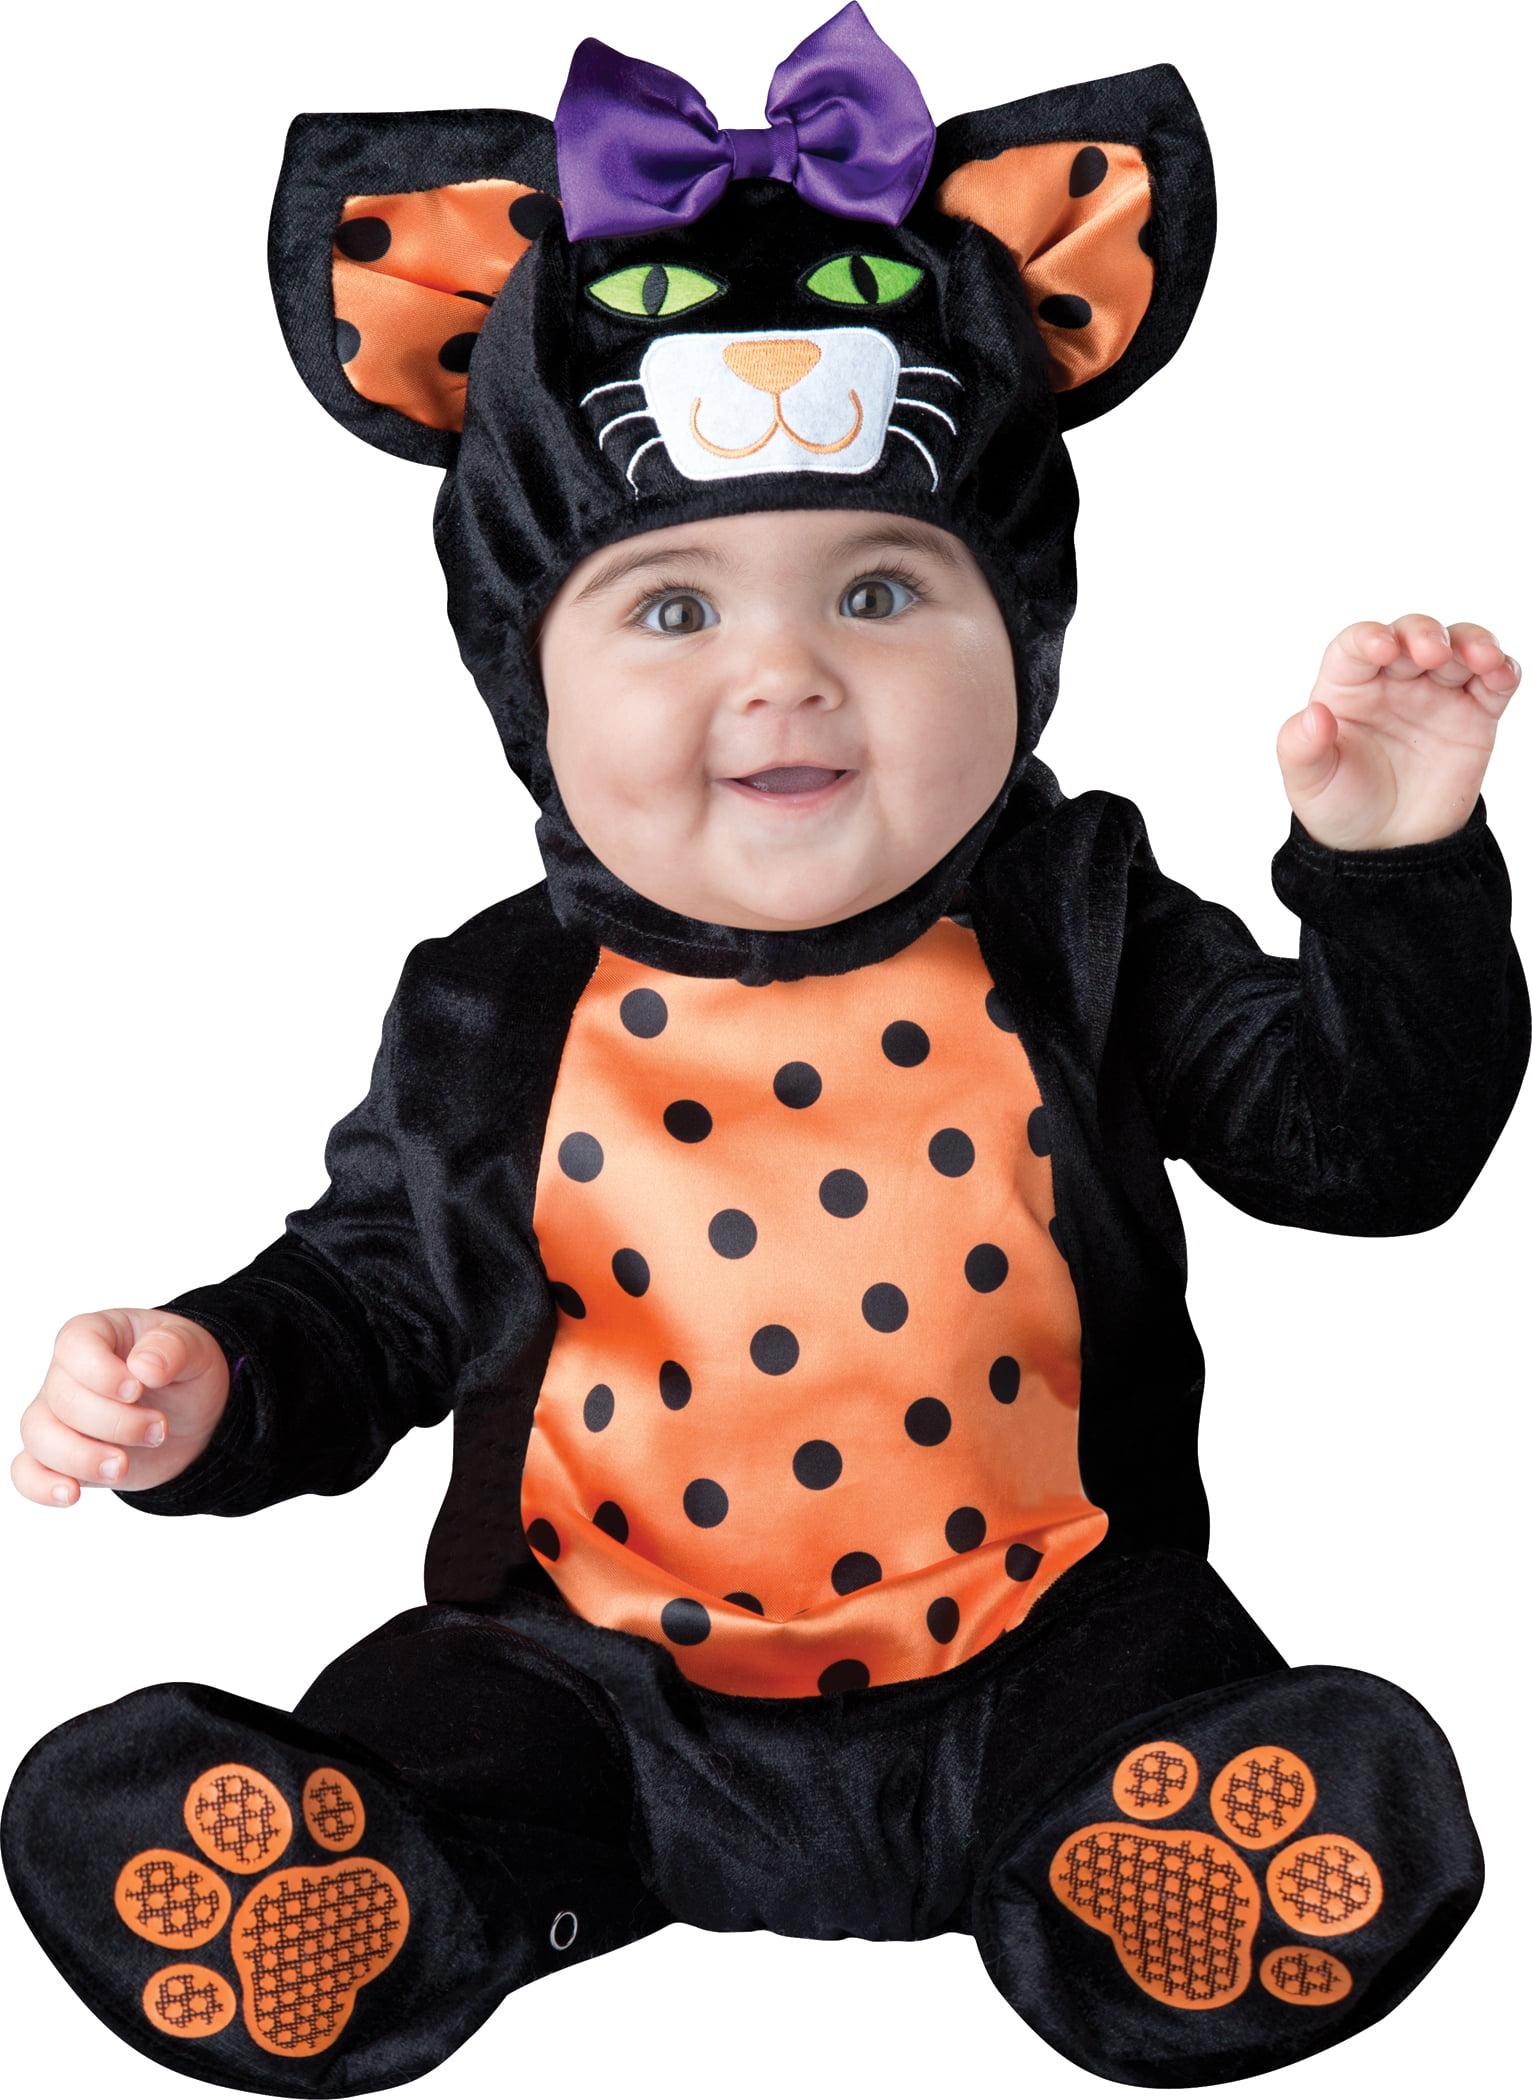 Infant Mini Meow Cat Costume by Incharacter Costumes LLC